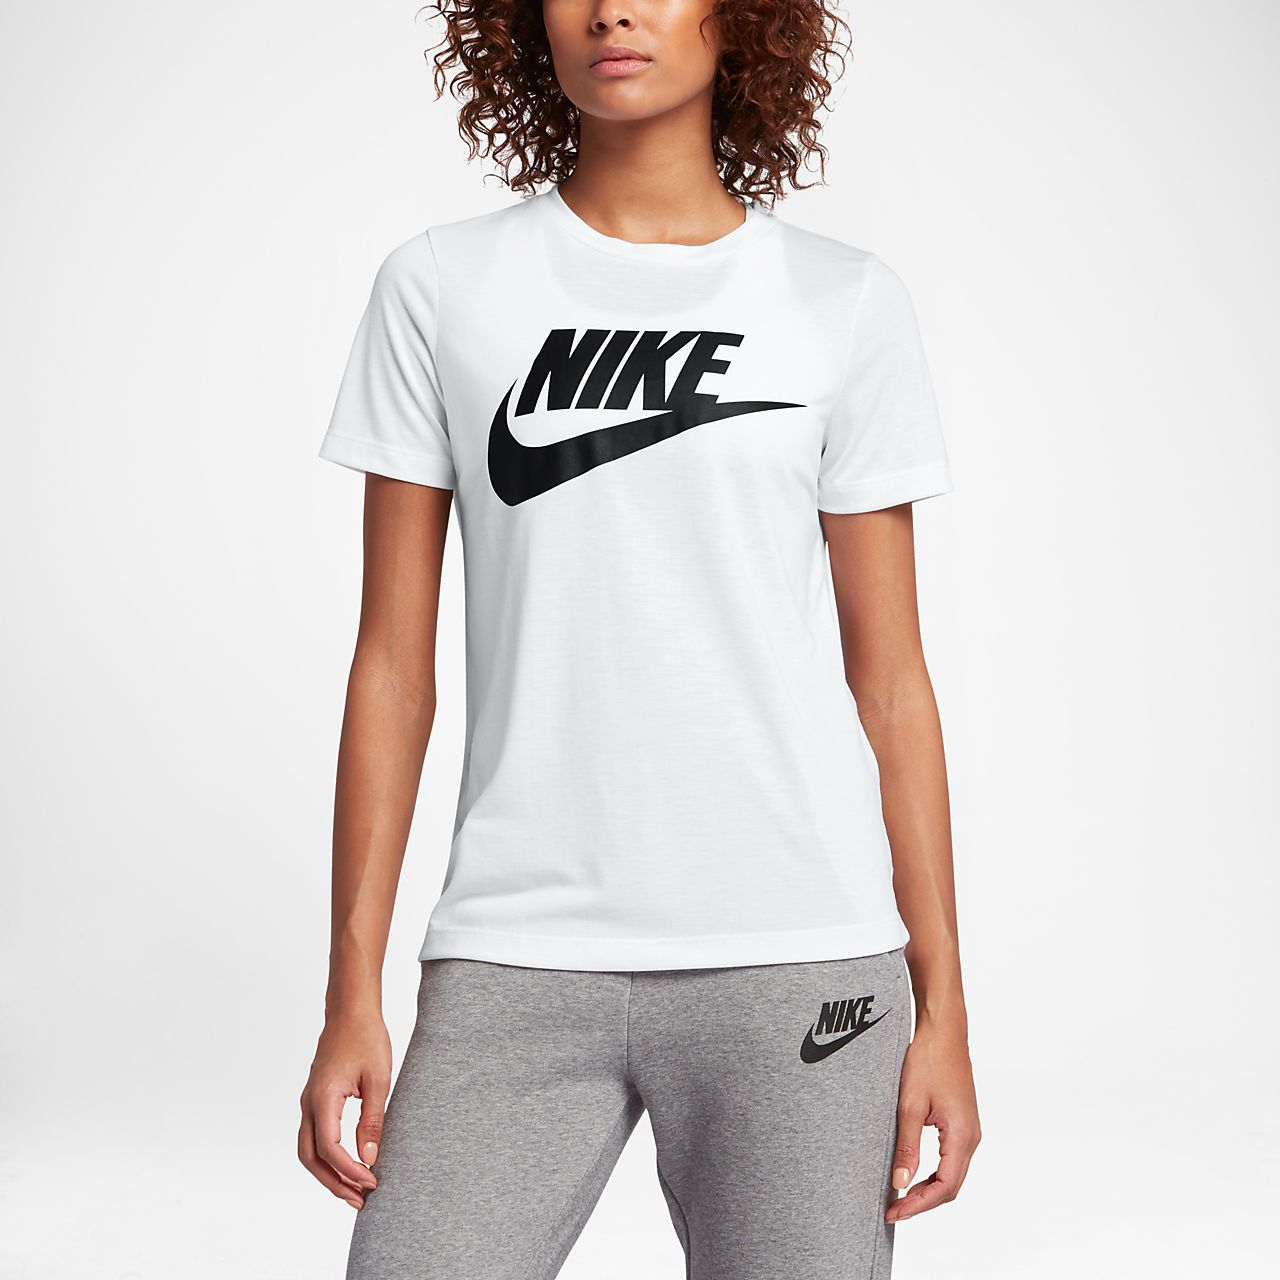 Женская футболка с коротким рукавом и логотипом Nike Sportswear Essential